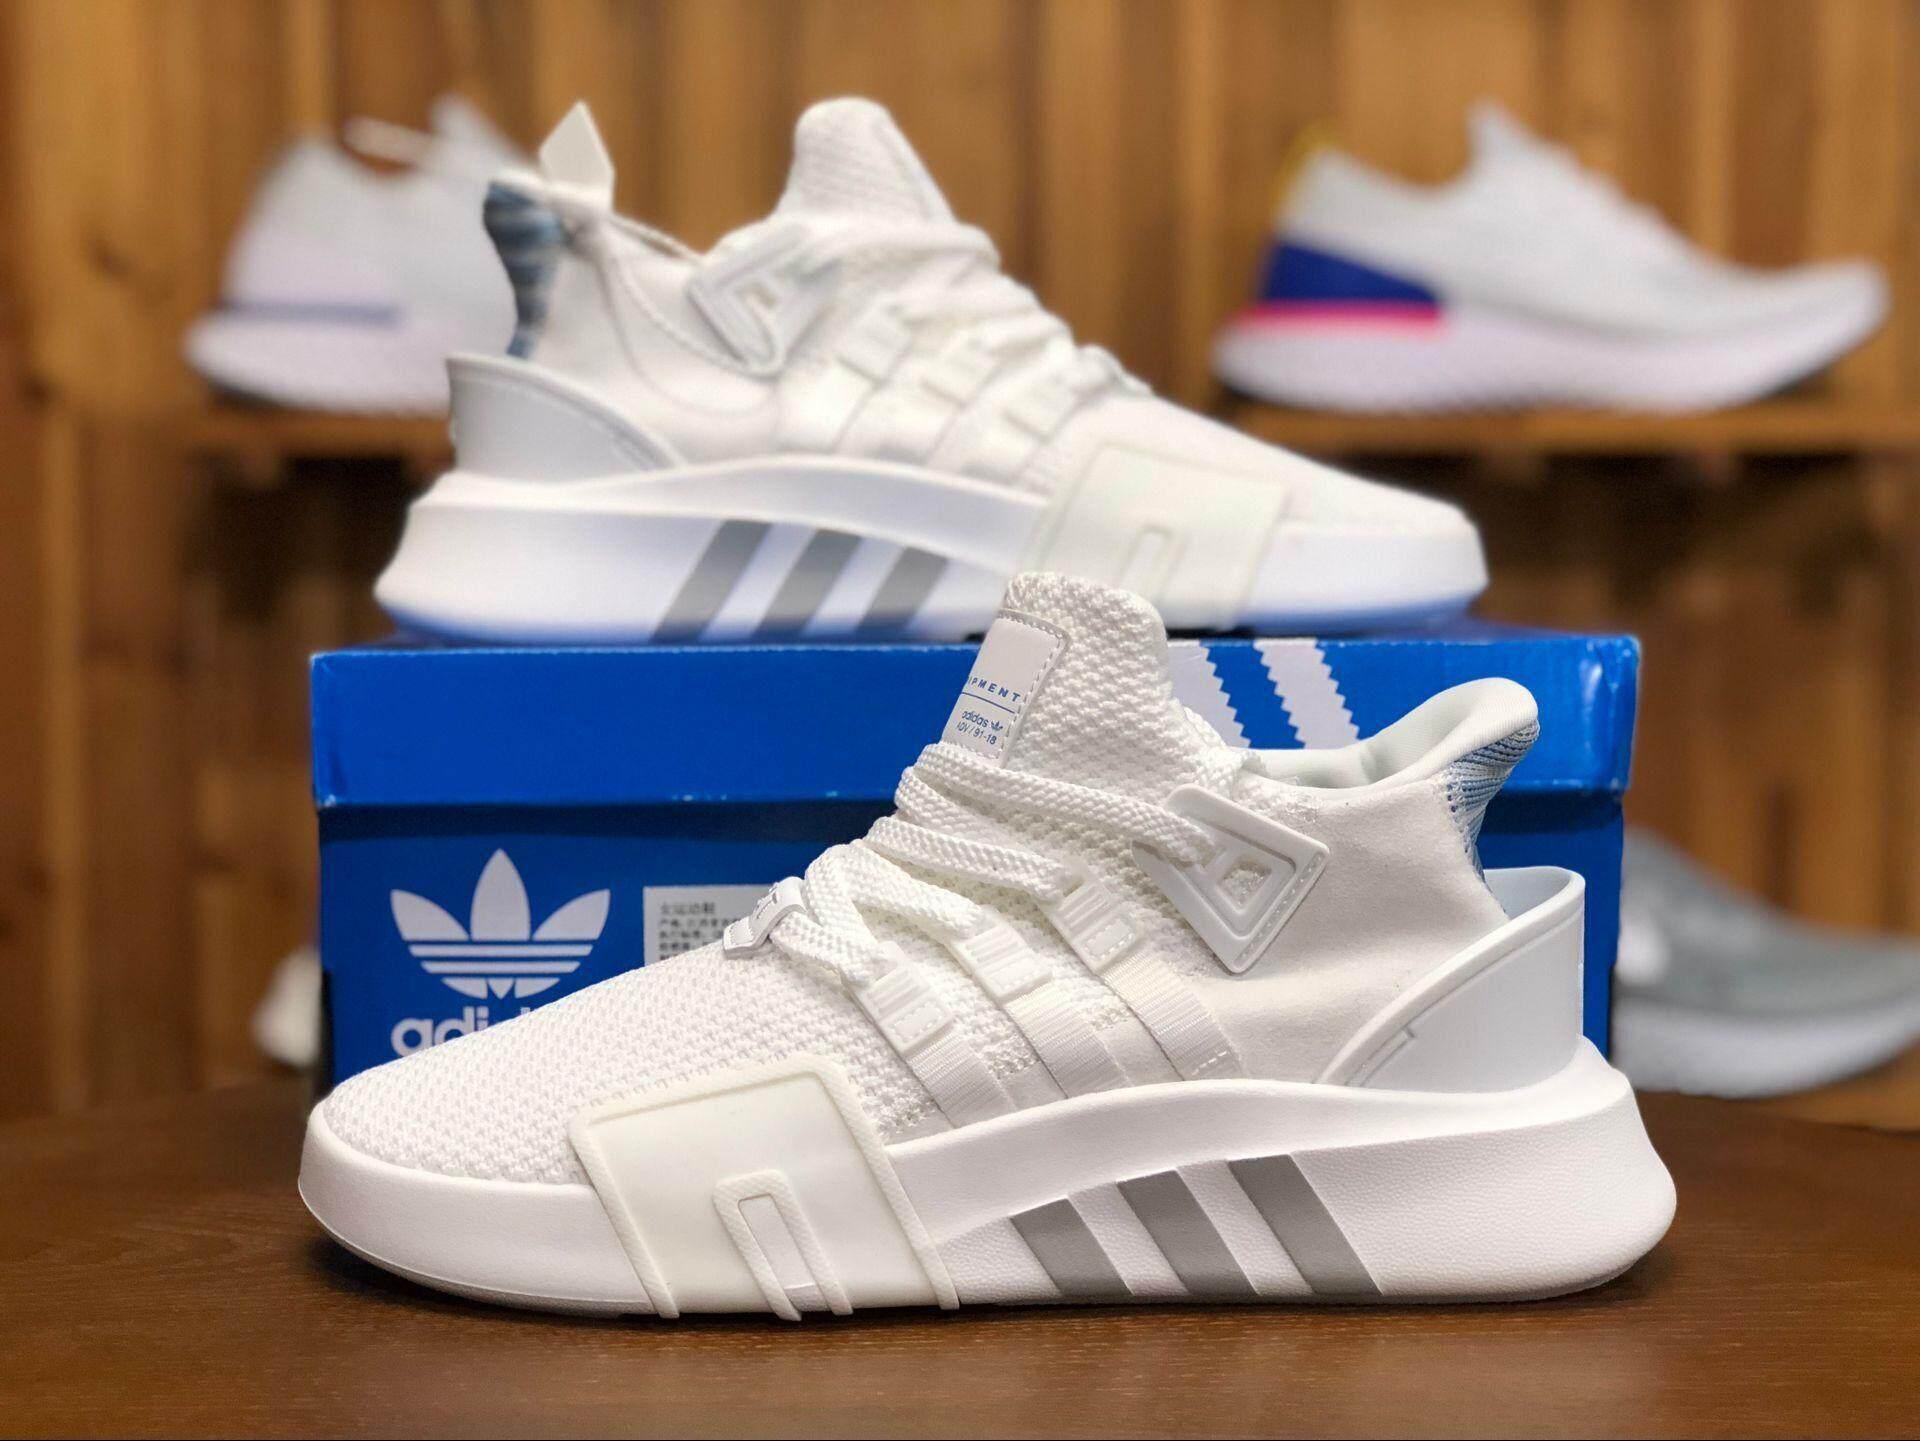 3f063dae087a Sale ADIDA Originals EQT Basketball ADV Women s Sneakers Sports Shoes AC7354  White